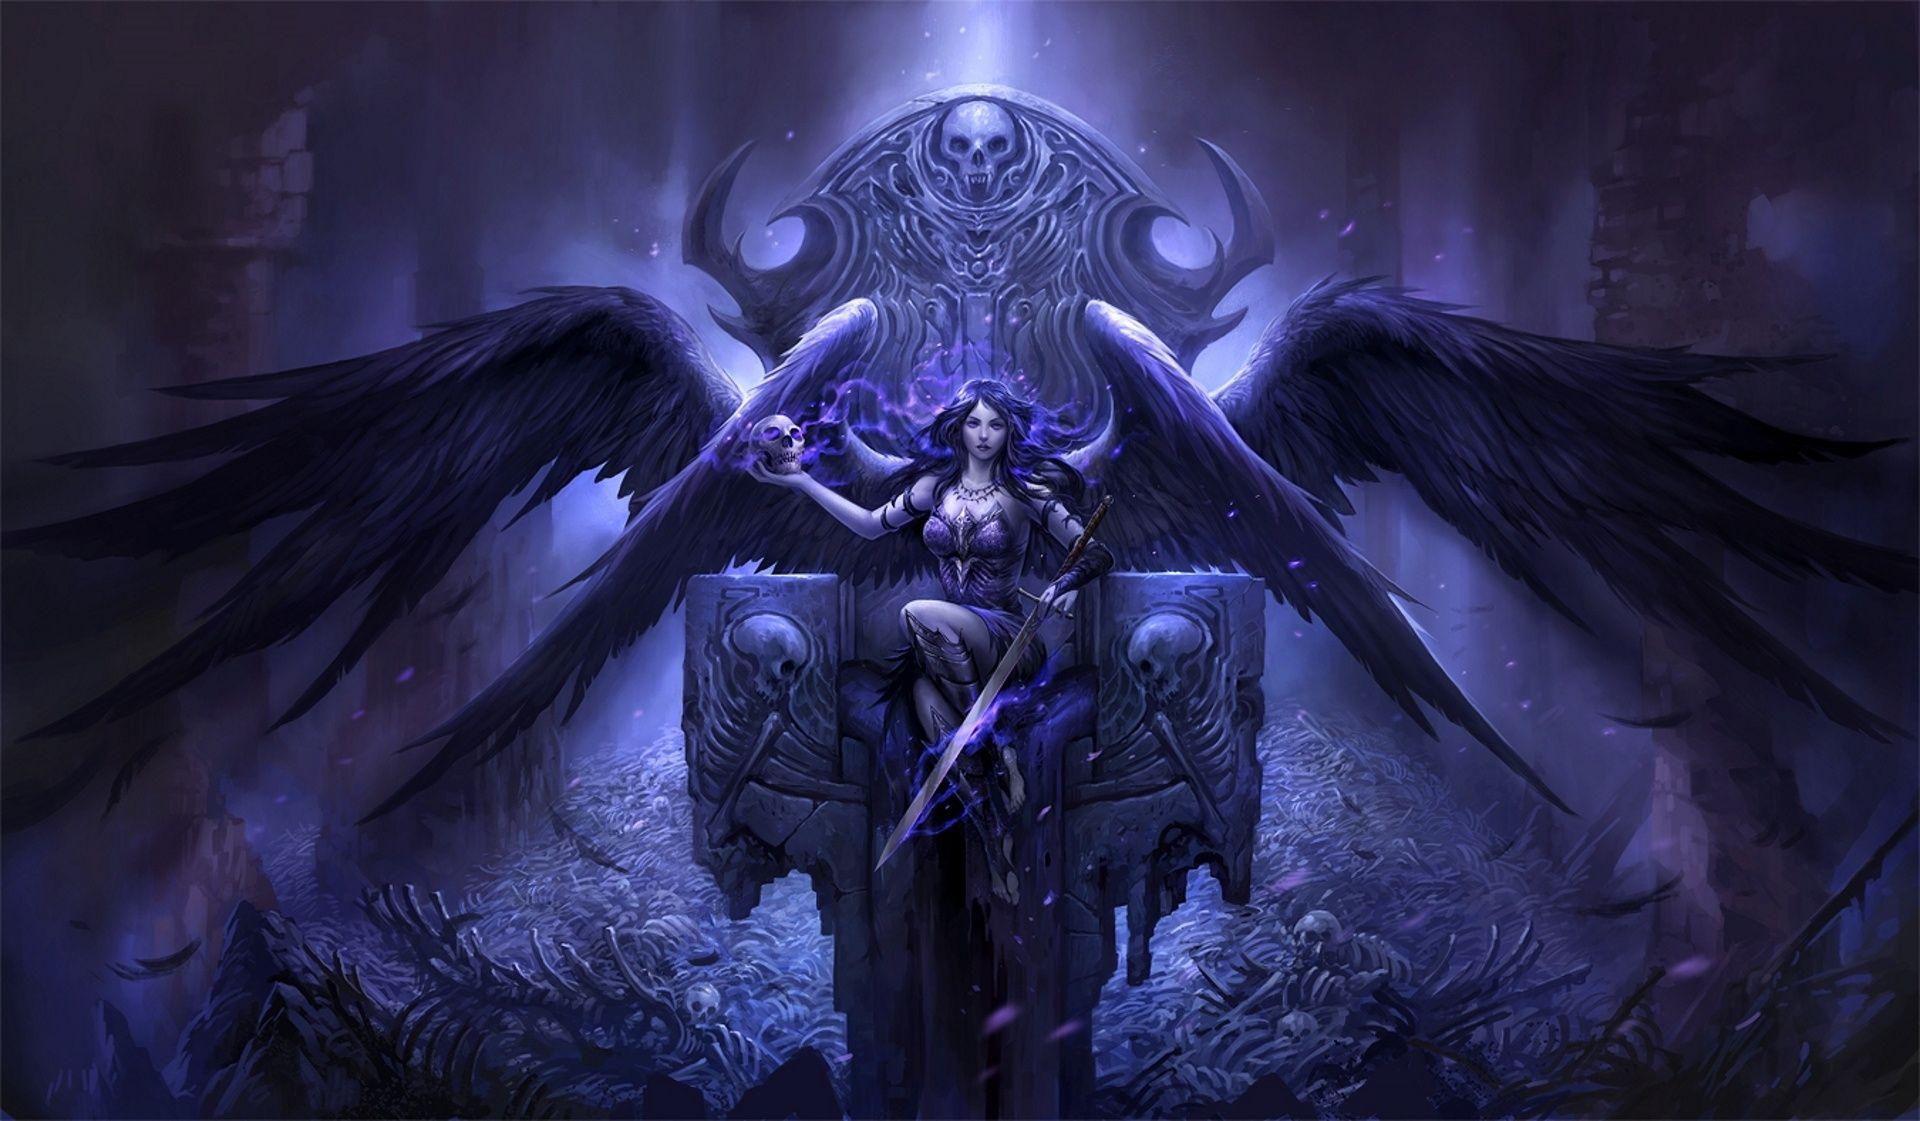 Gothic occult angel//devil in flight comic FANTASY ART 8x10